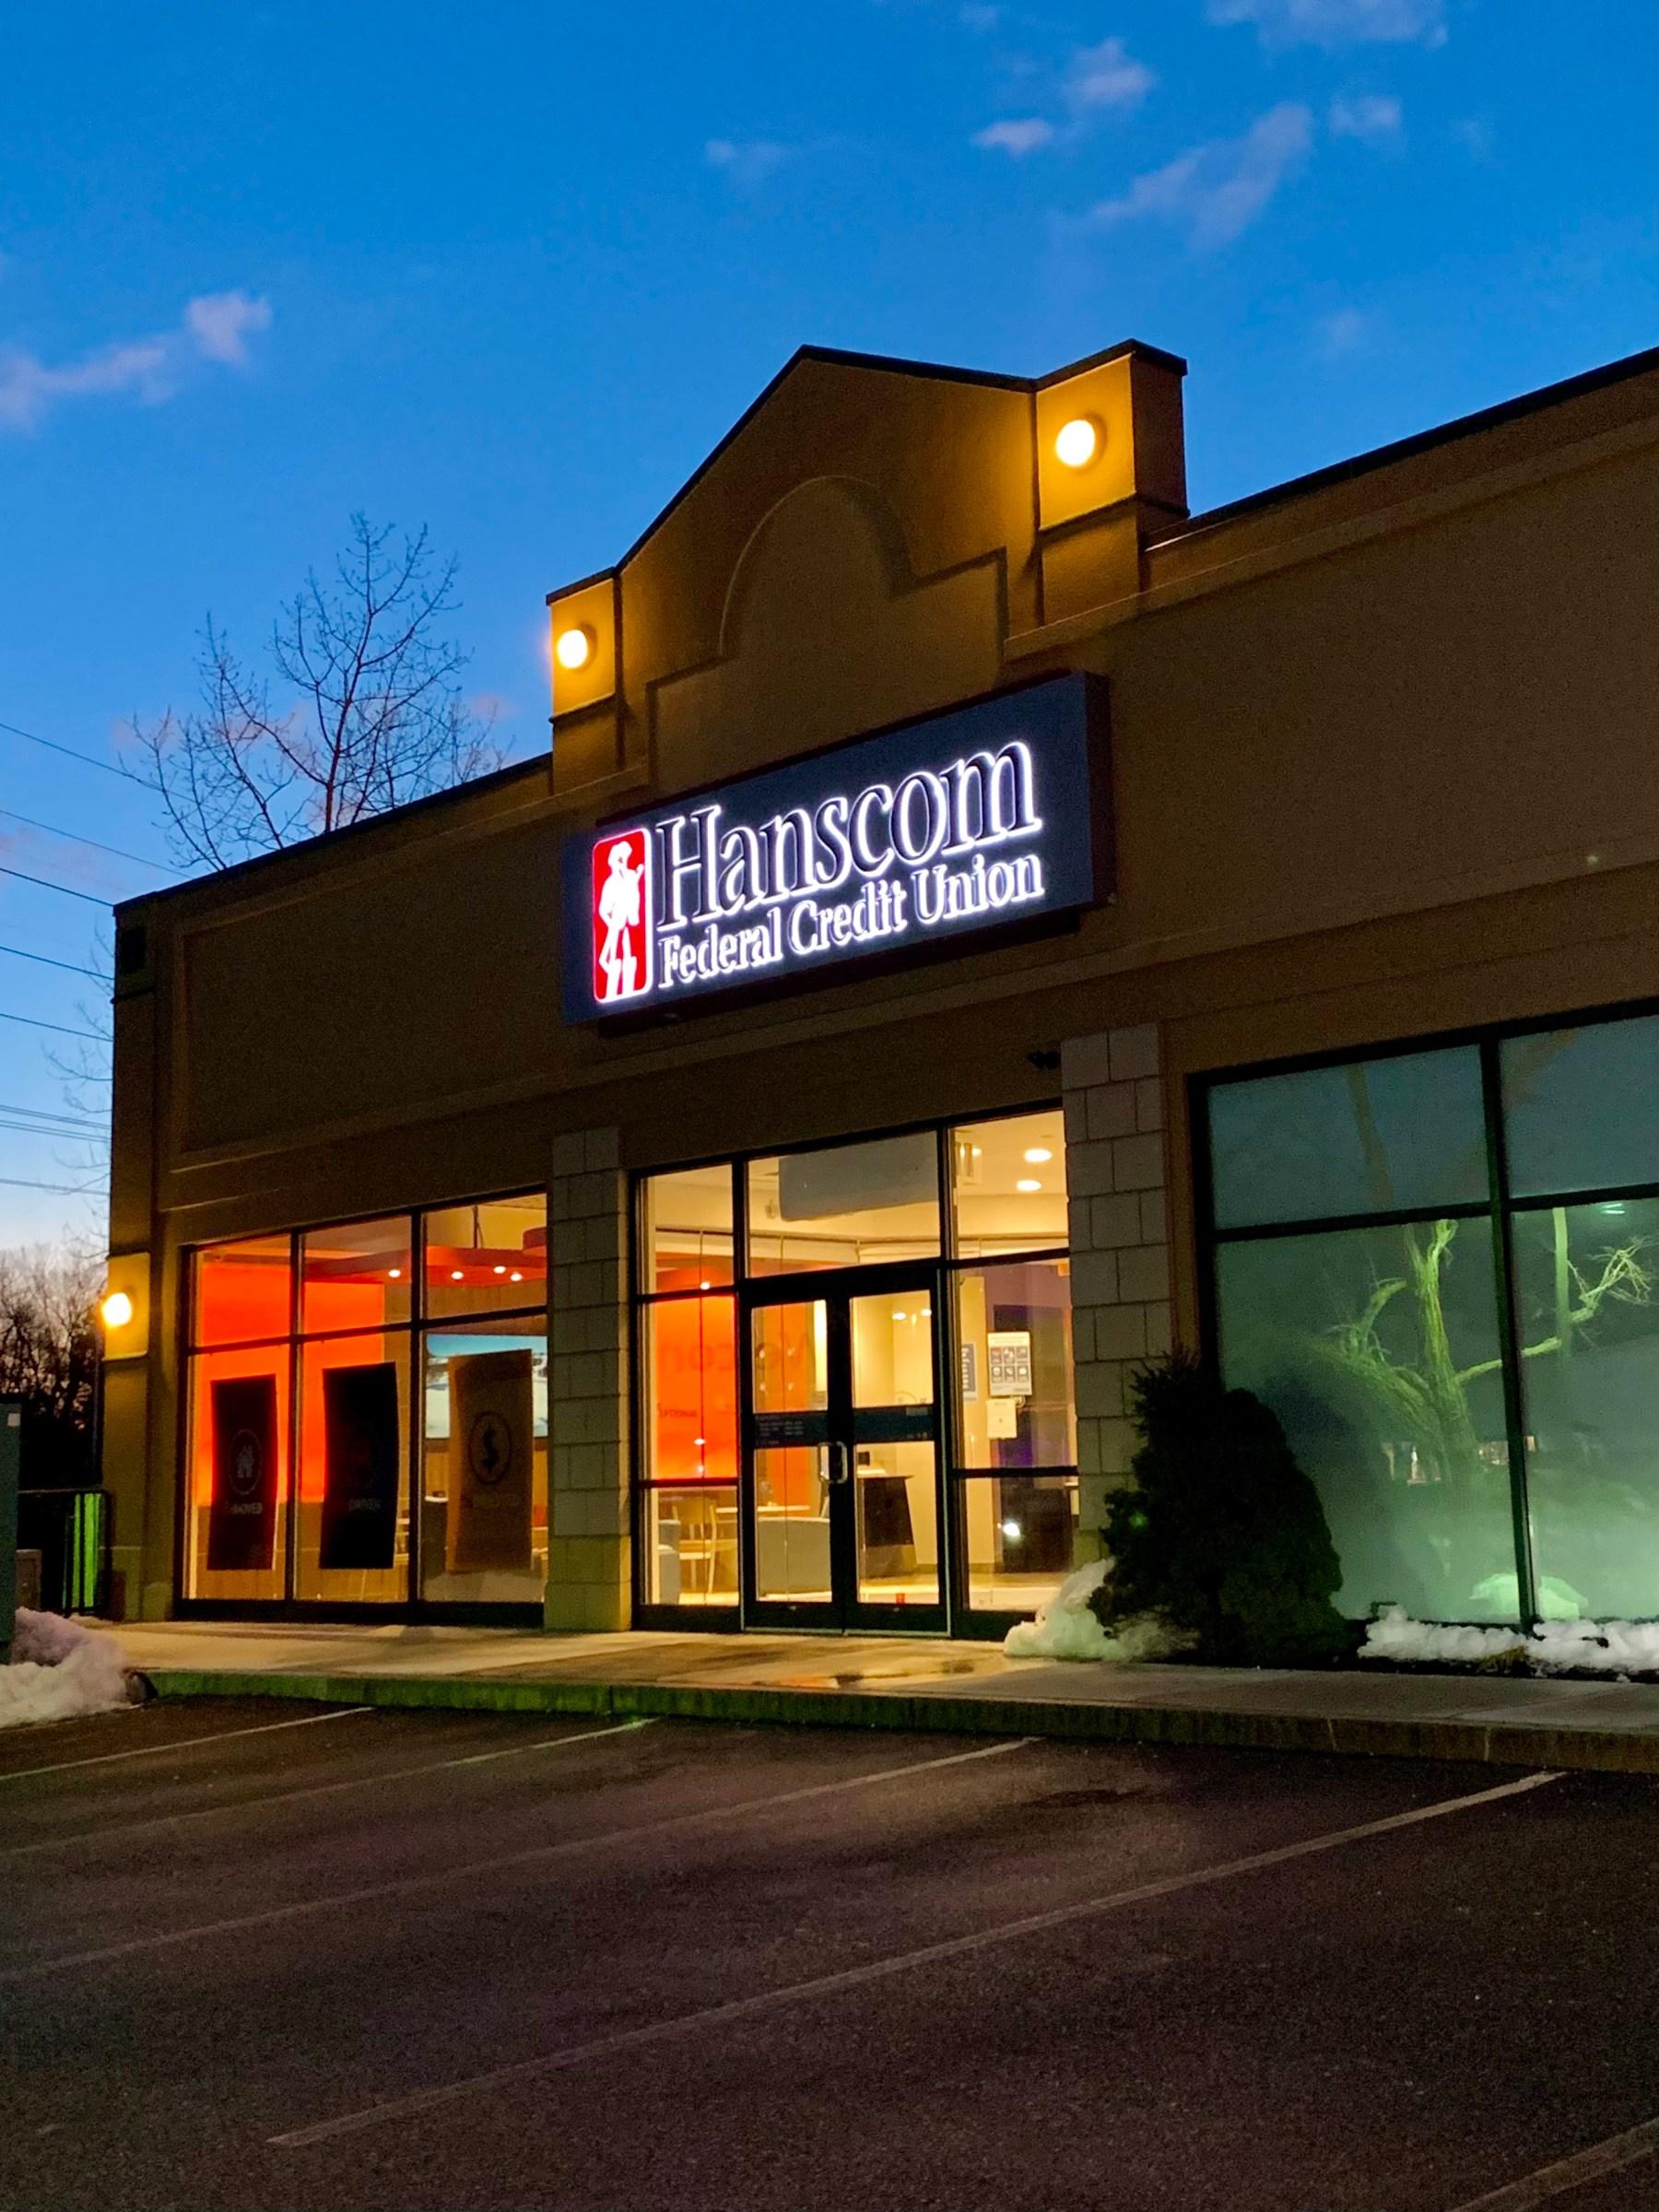 Hanscom Federal Credit Union, 47 Middlesex Turnpike, Burlington, MA